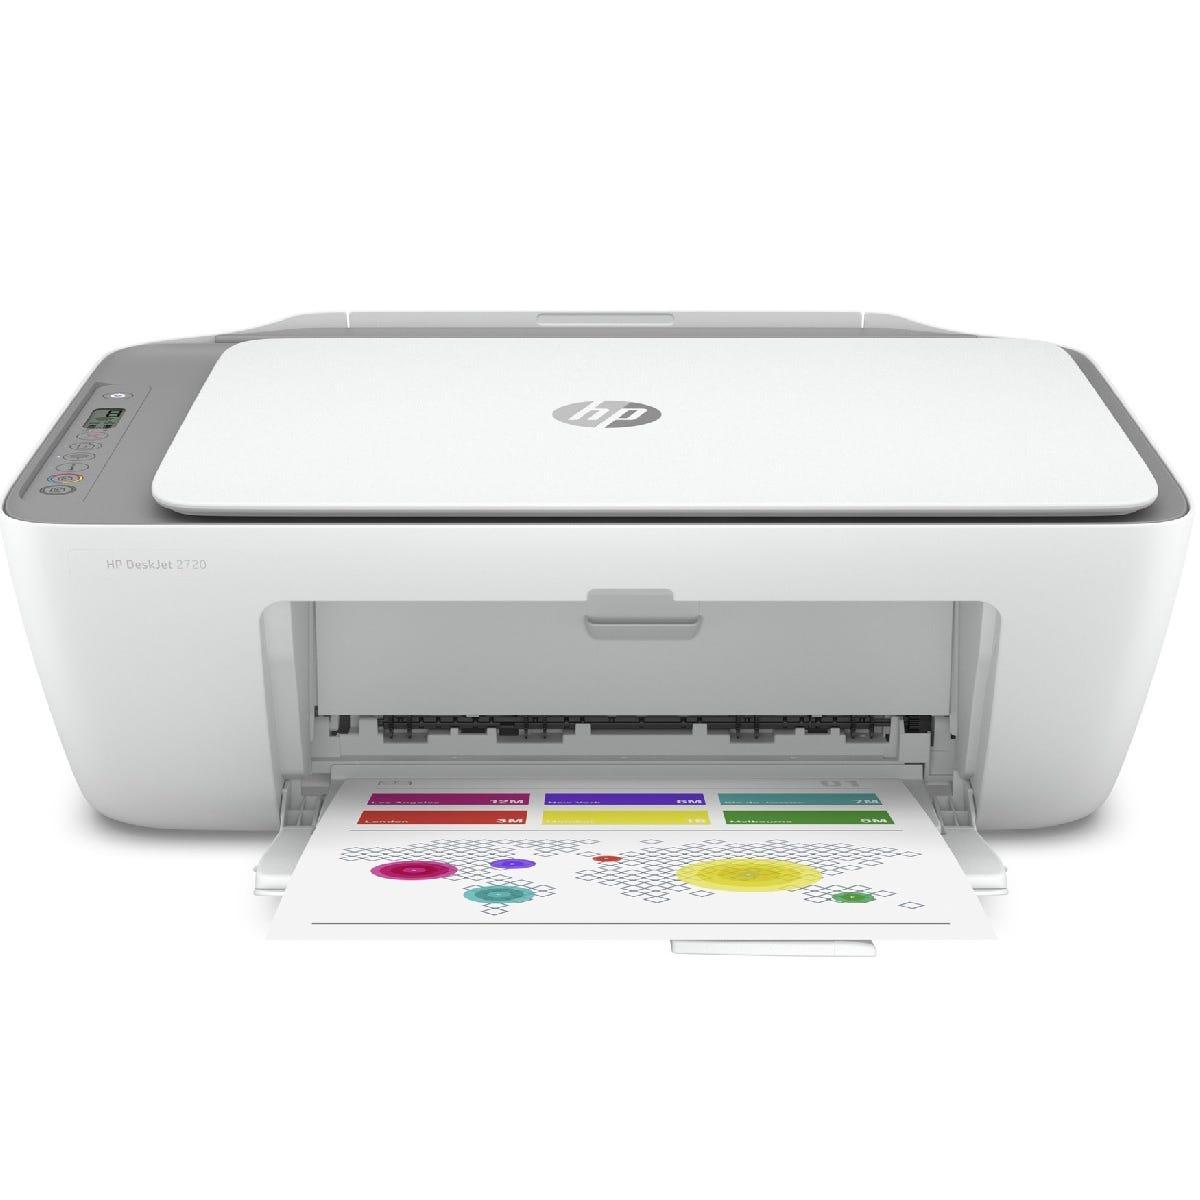 HP Deskjet 2720e Wireless All-in-One Printer - Cement Grey/White